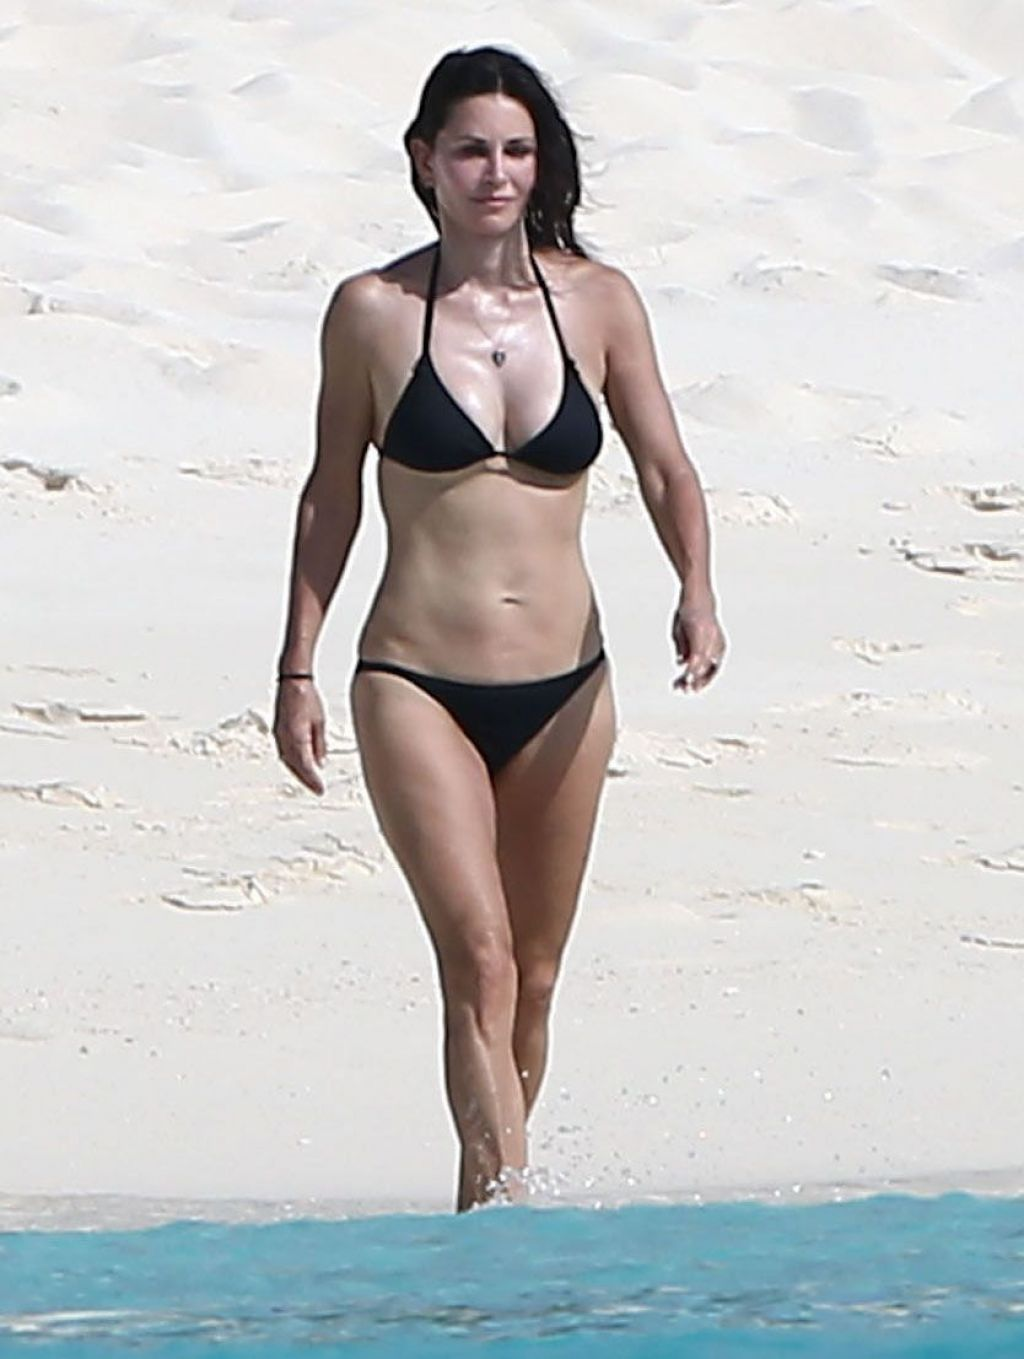 Santa Monica Mercedes >> Courteney Cox Wearing a Bikini on the Beach in Turks and Caicos - June 2014